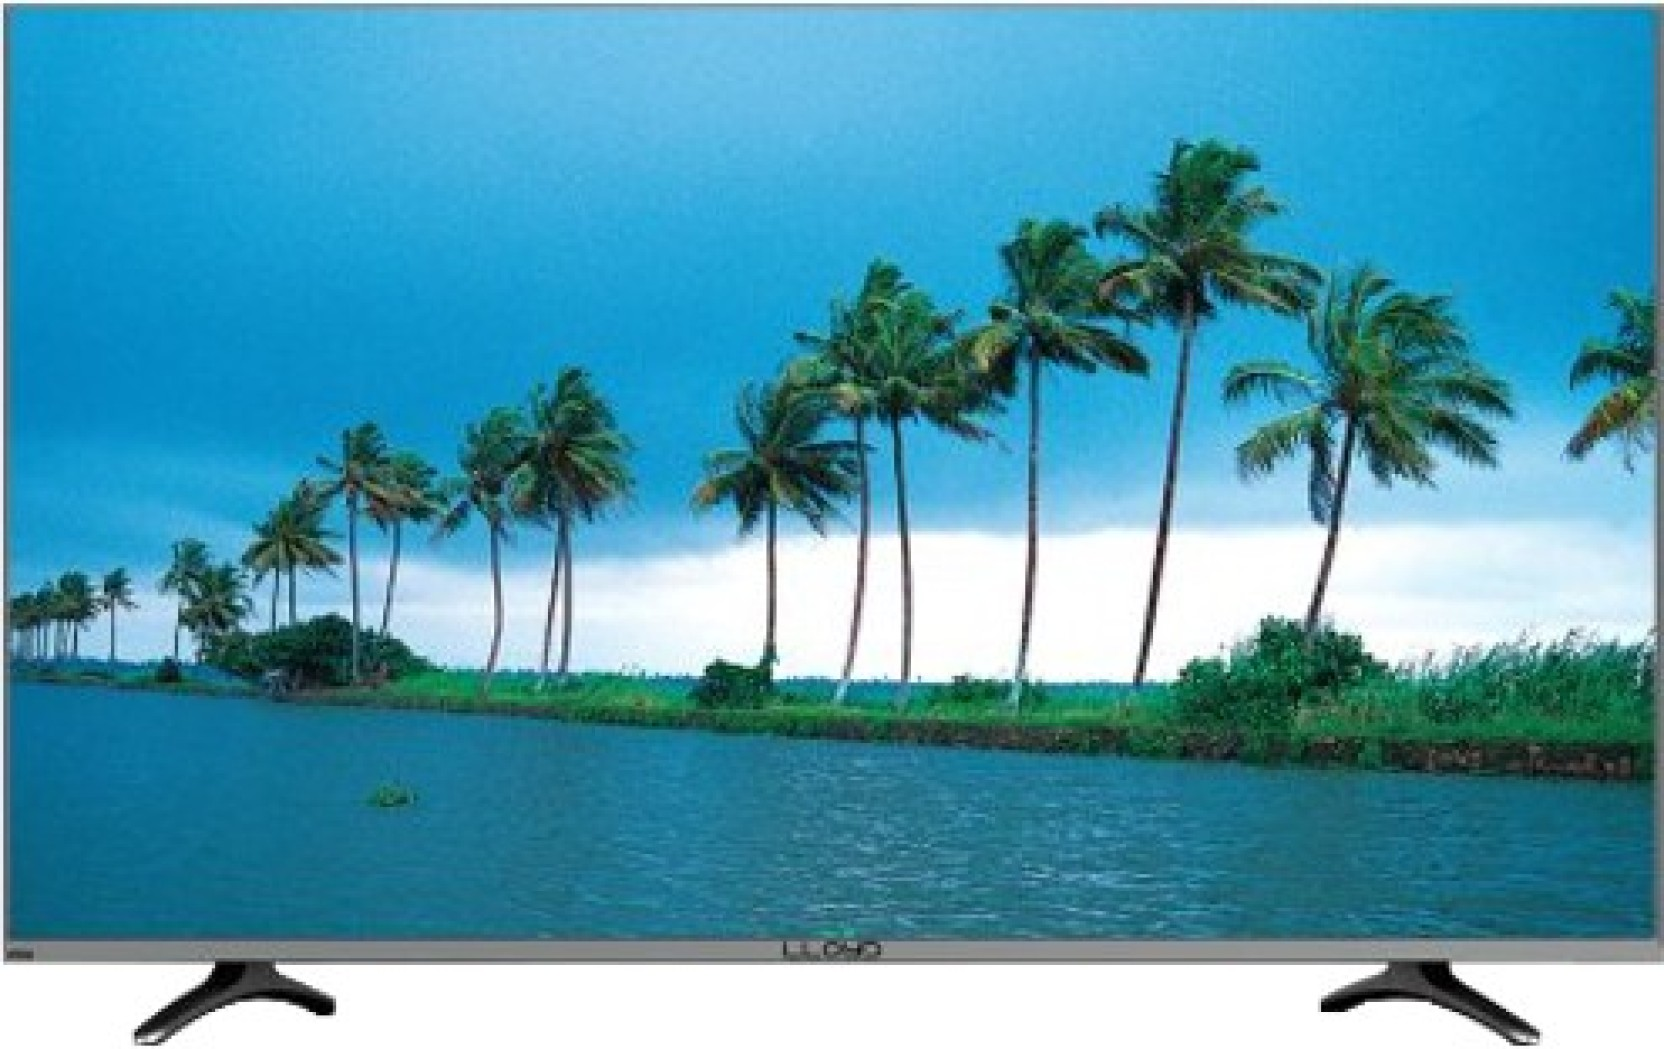 Lloyd 102cm 40 Inch Ultra Hd 4k Led Smart Tv Online At Best Oxone 1080 Professional Pressure Cooker Home